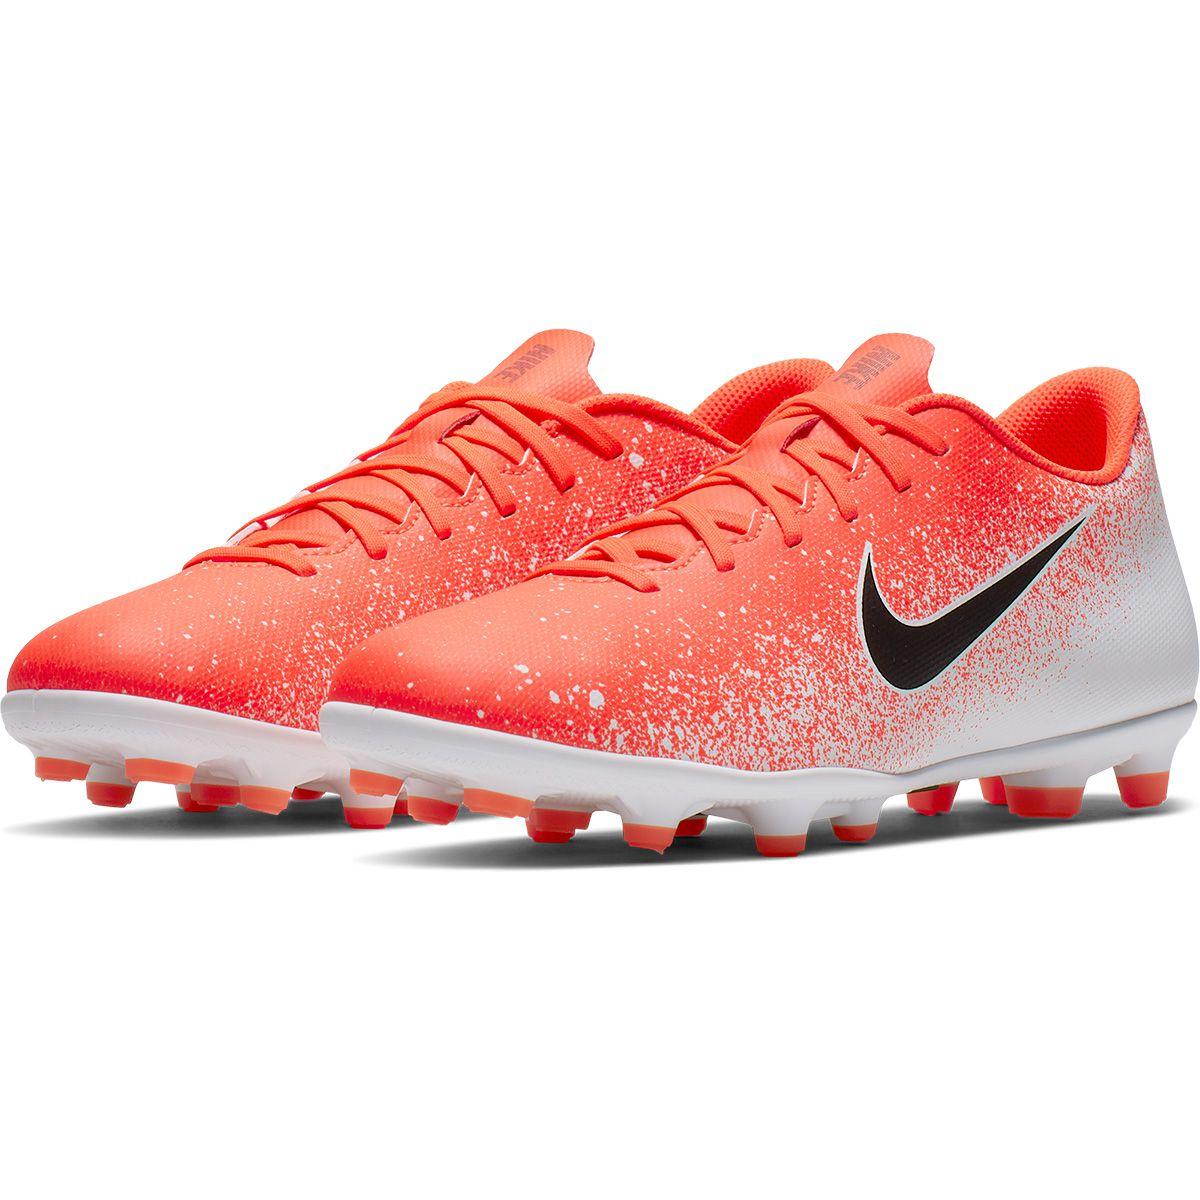 Chuteira Campo Nike Vapor 12 Club FG Mg Ah7378801